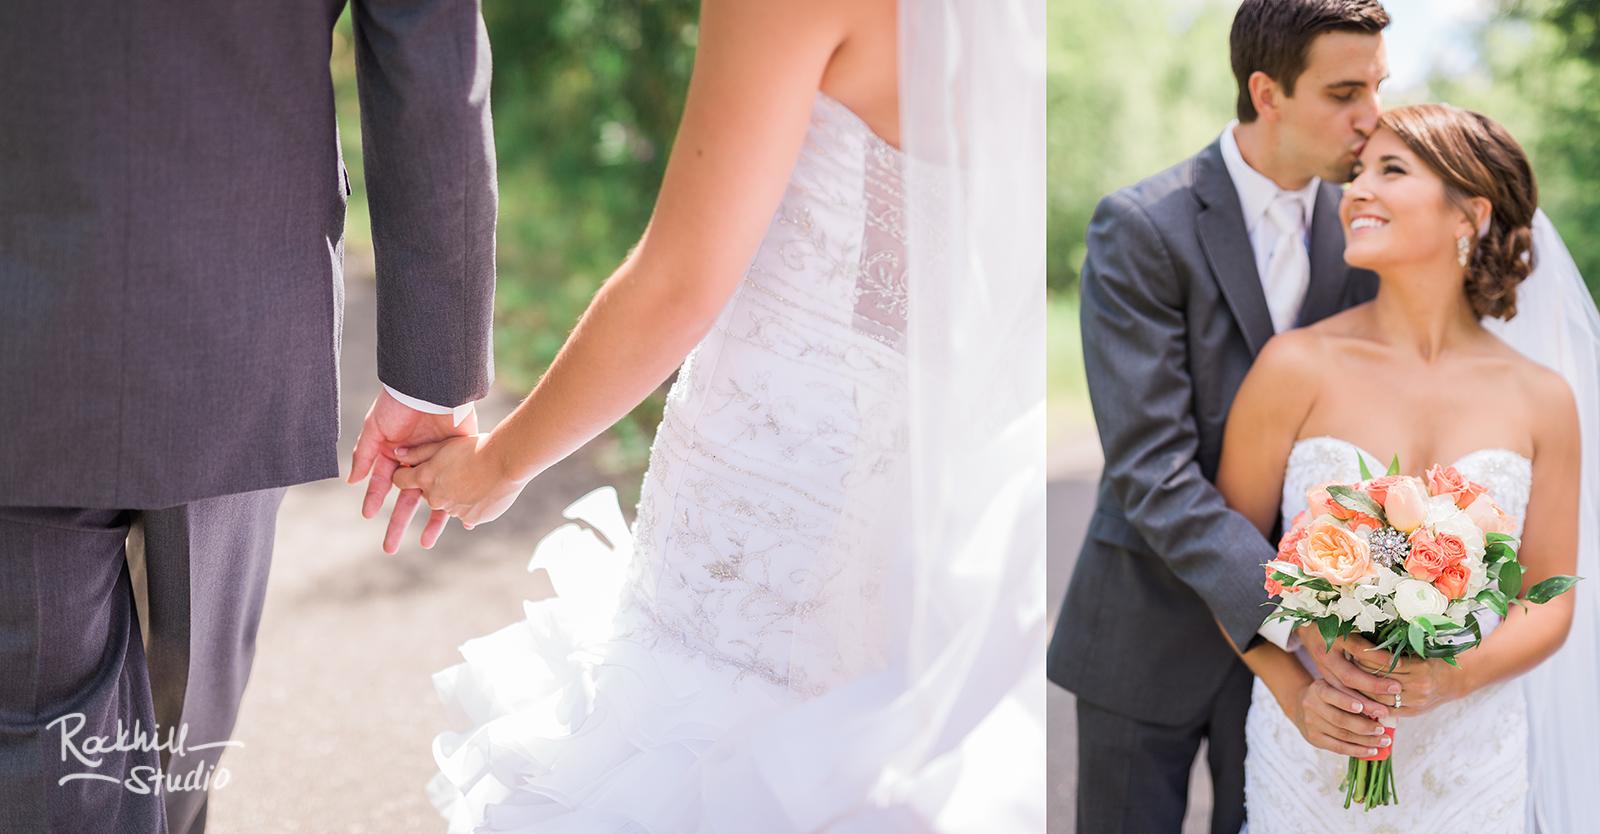 marquette-wedding-upper-peninsula-northern-michigan-wedding-ck-photography-wedding-party-2.jpg